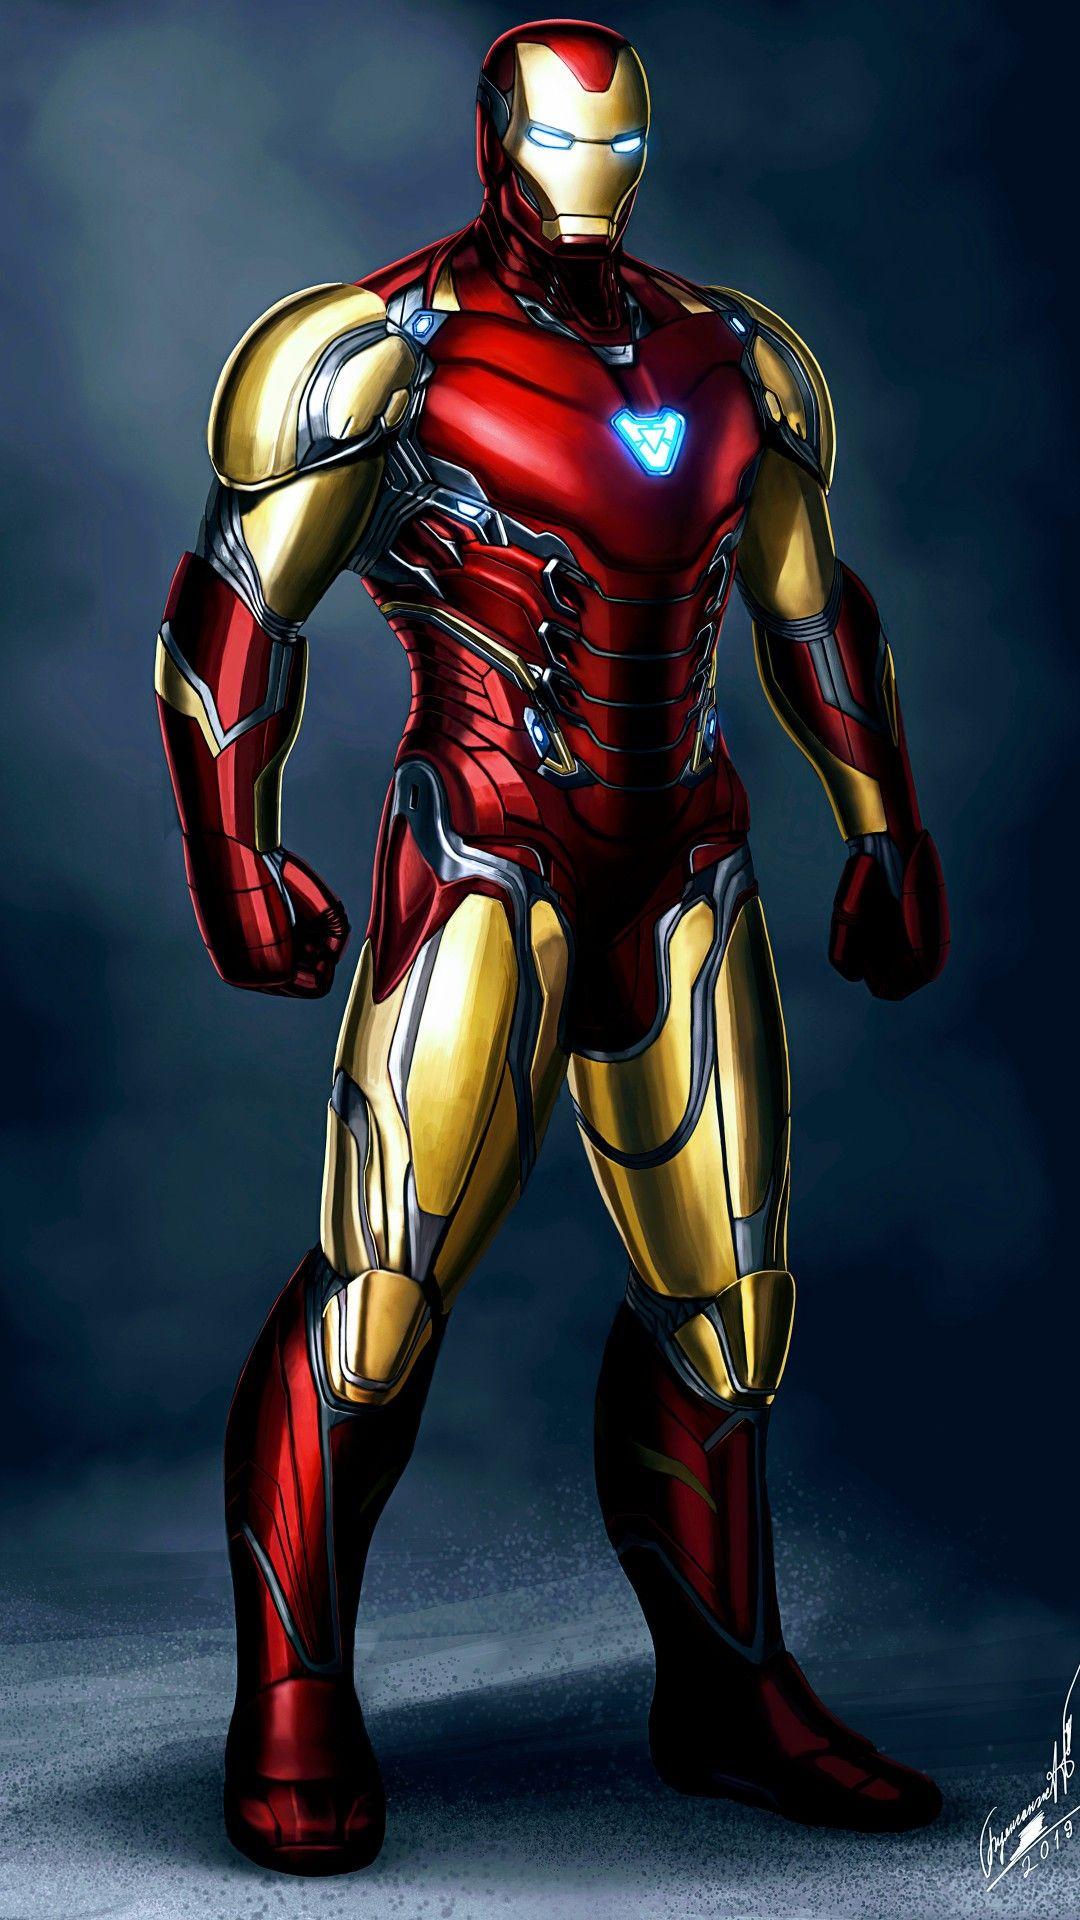 Iron Man Tony Stark Iron Man Comic Iron Man Art Iron Man Photos